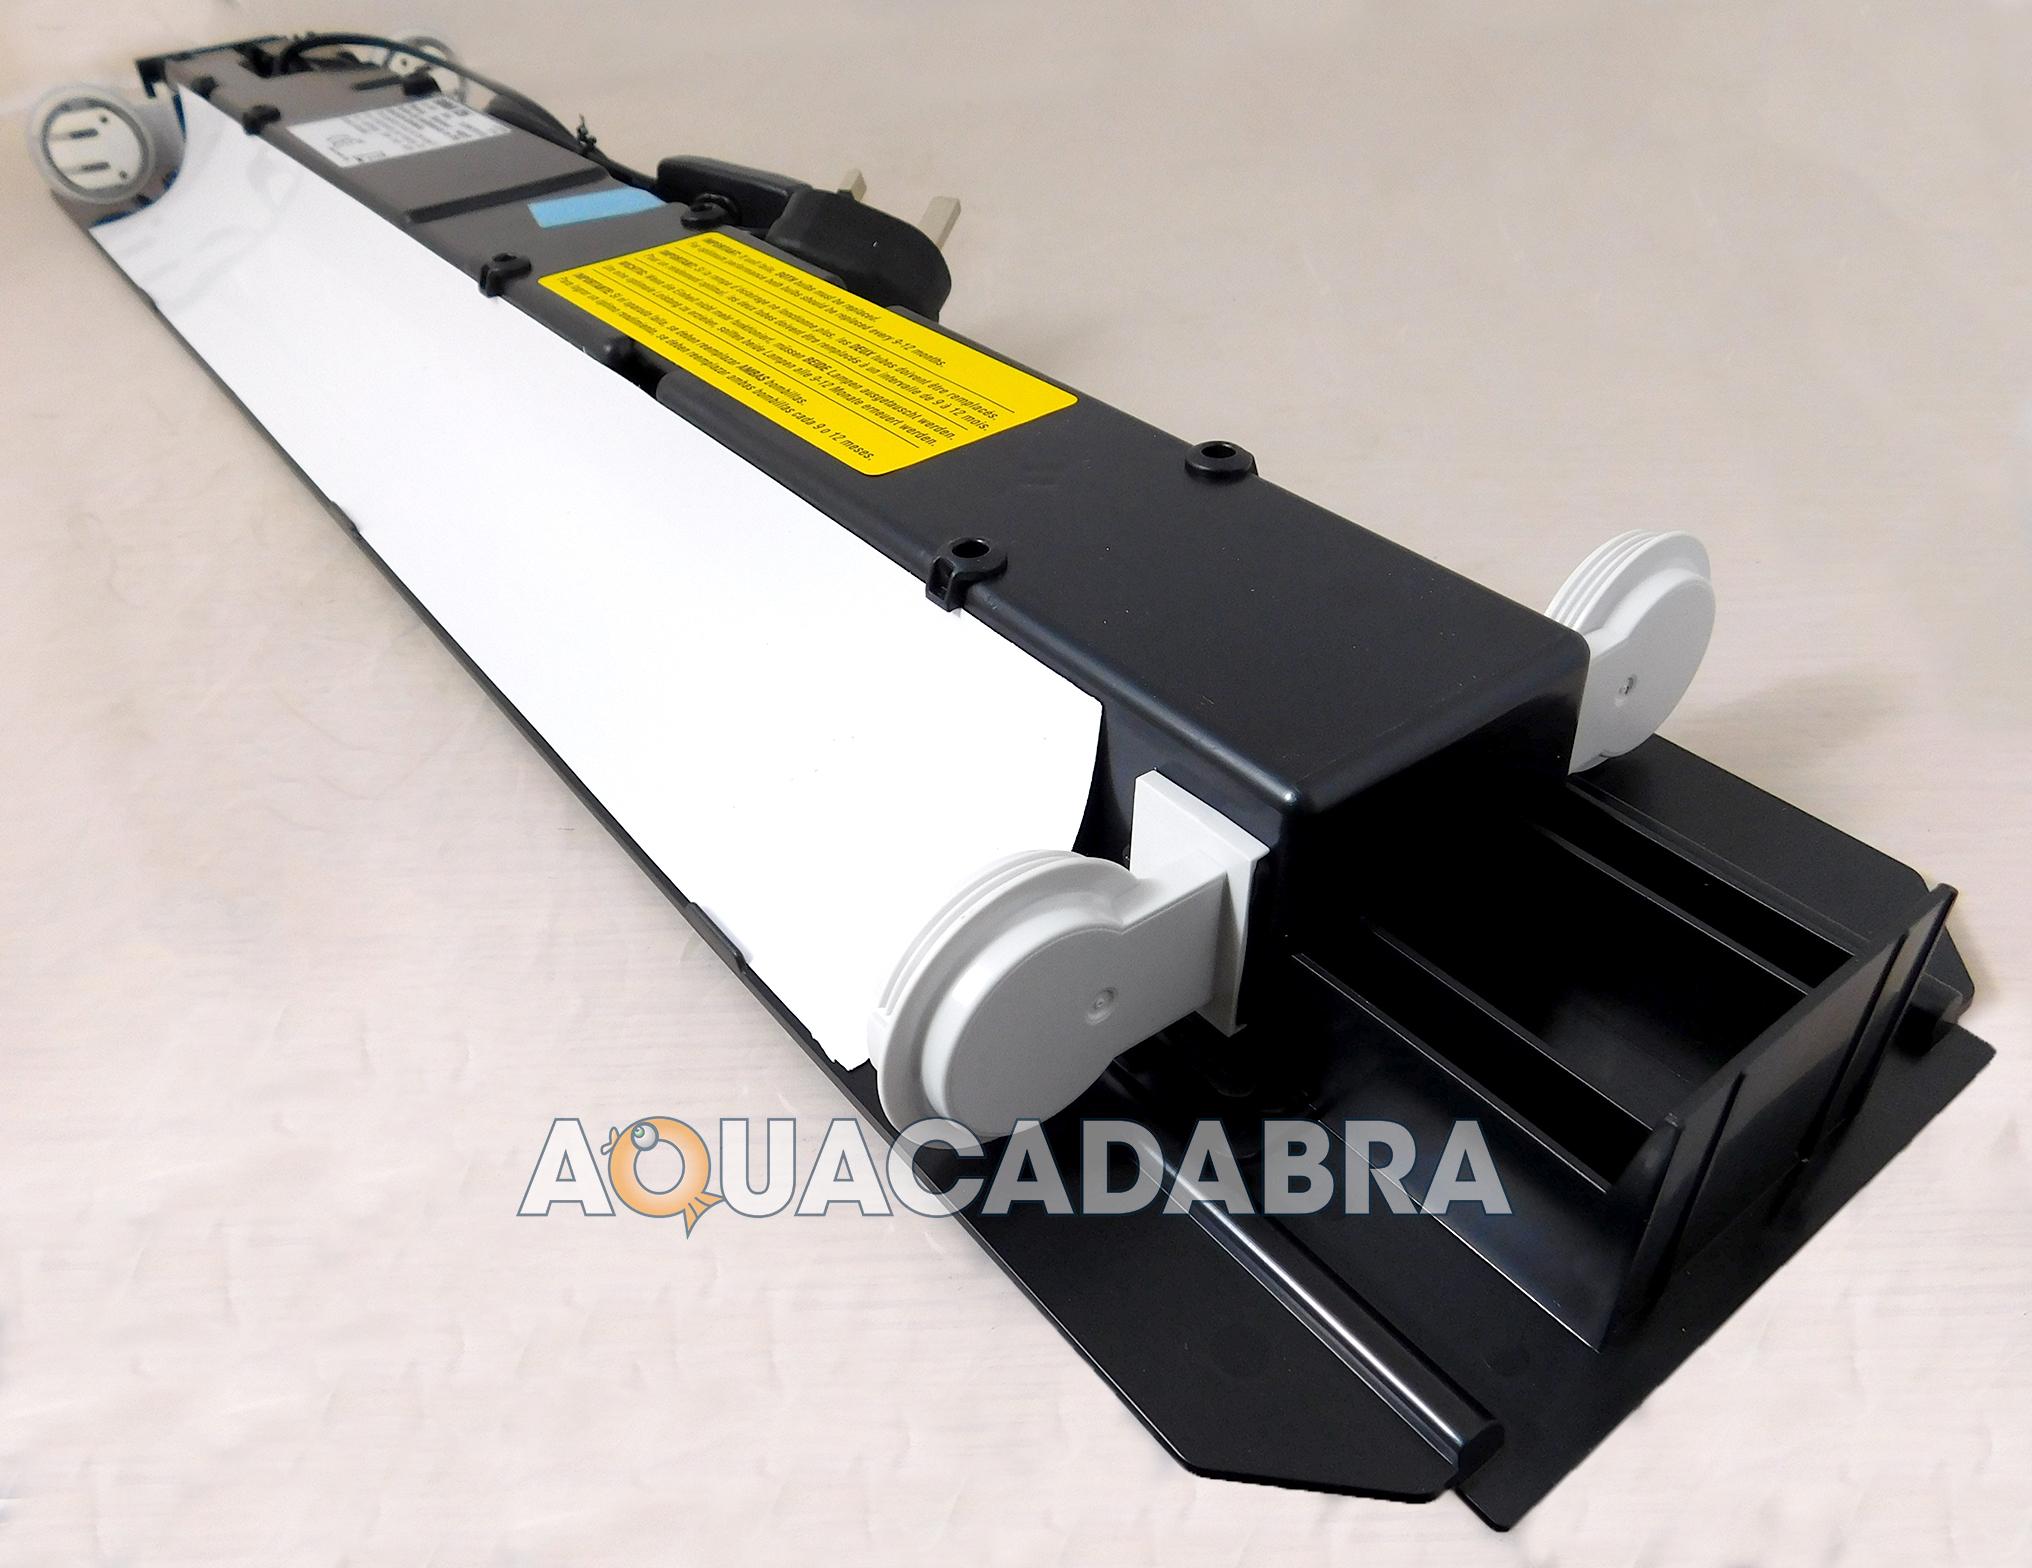 Fluval Roma Light Unit Replacement 90 125 200 240 T8 Light